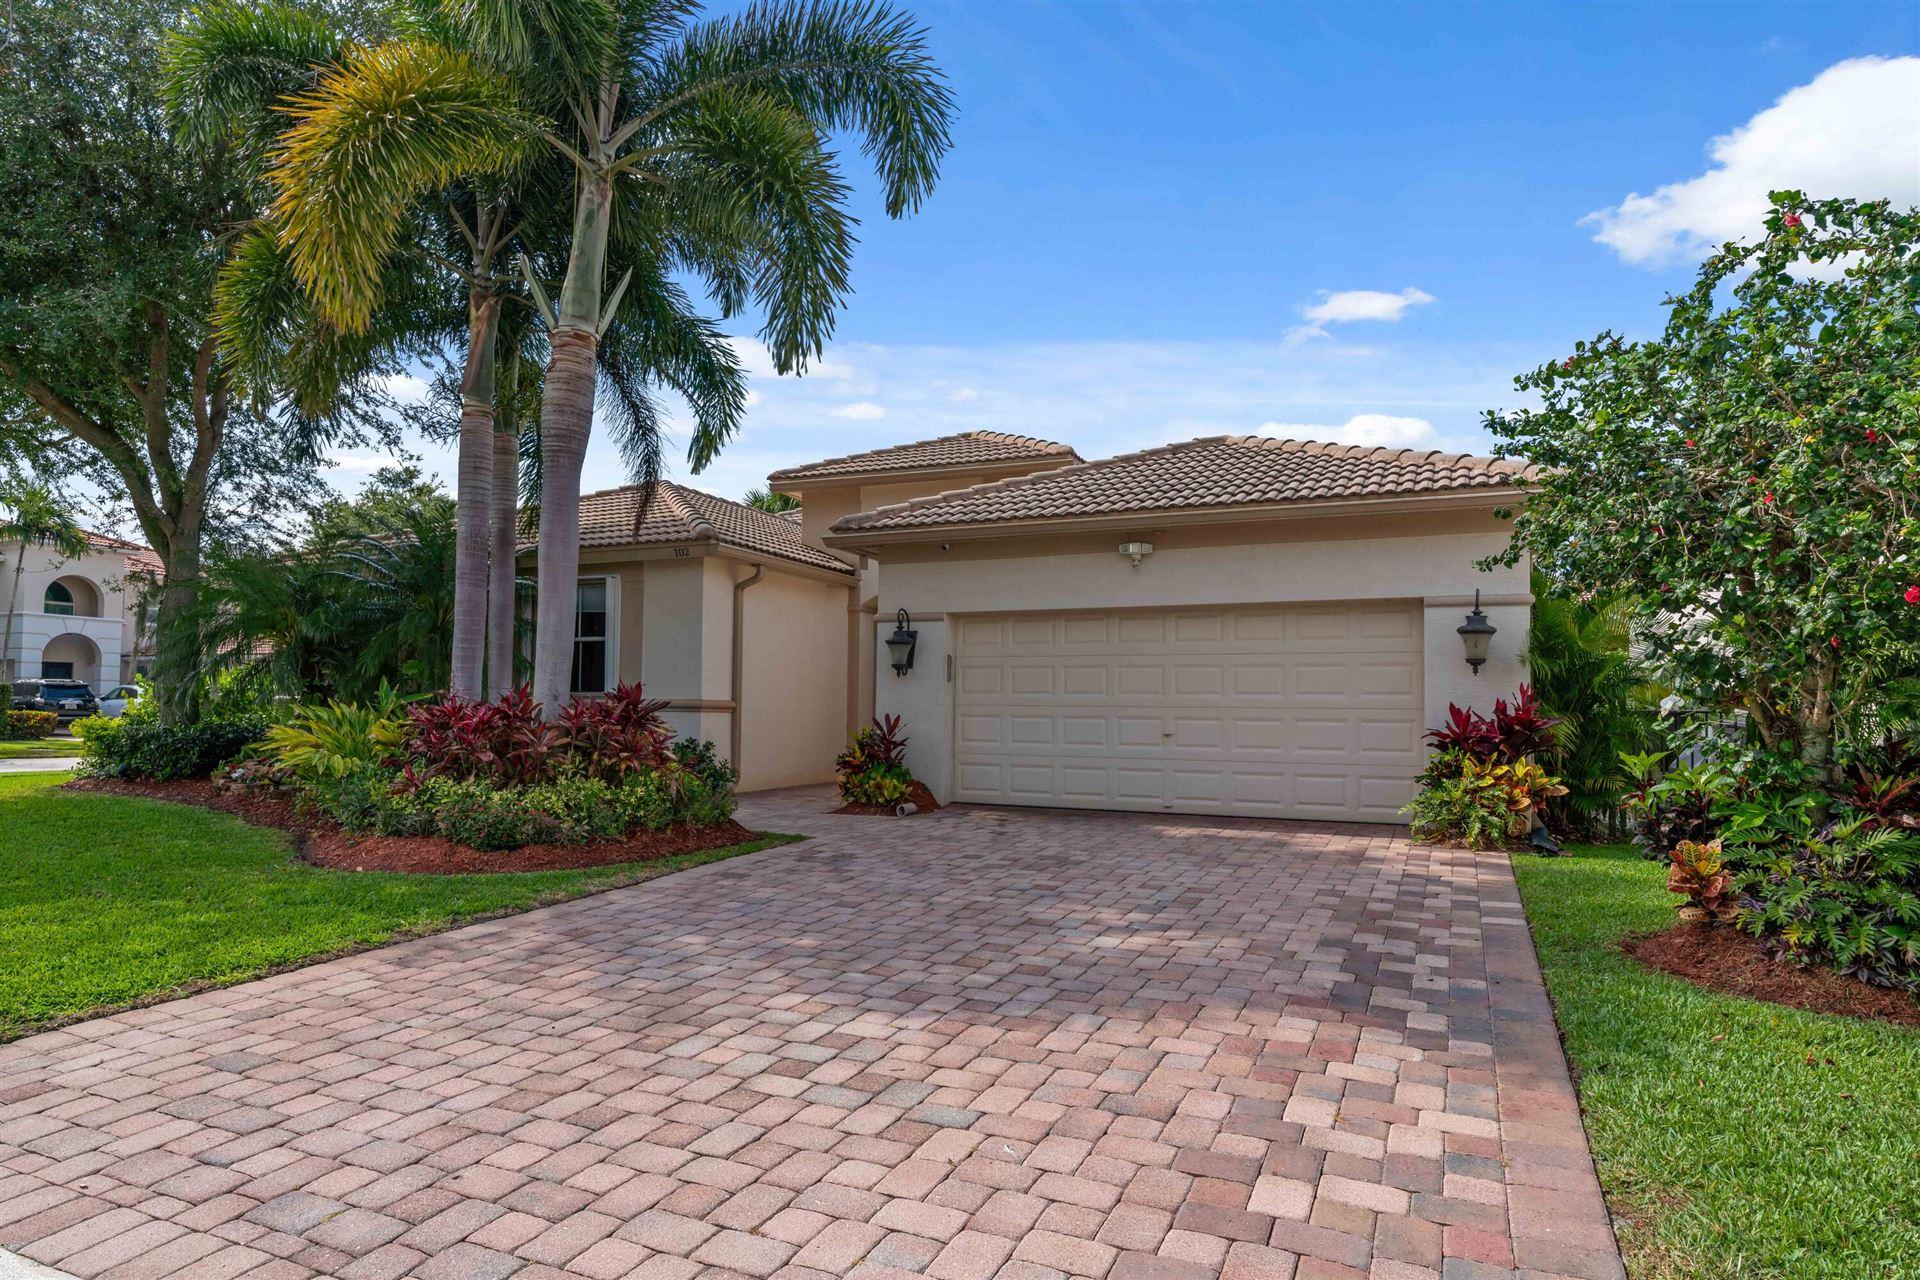 Photo of 102 San Vincente Place, Palm Beach Gardens, FL 33418 (MLS # RX-10714432)